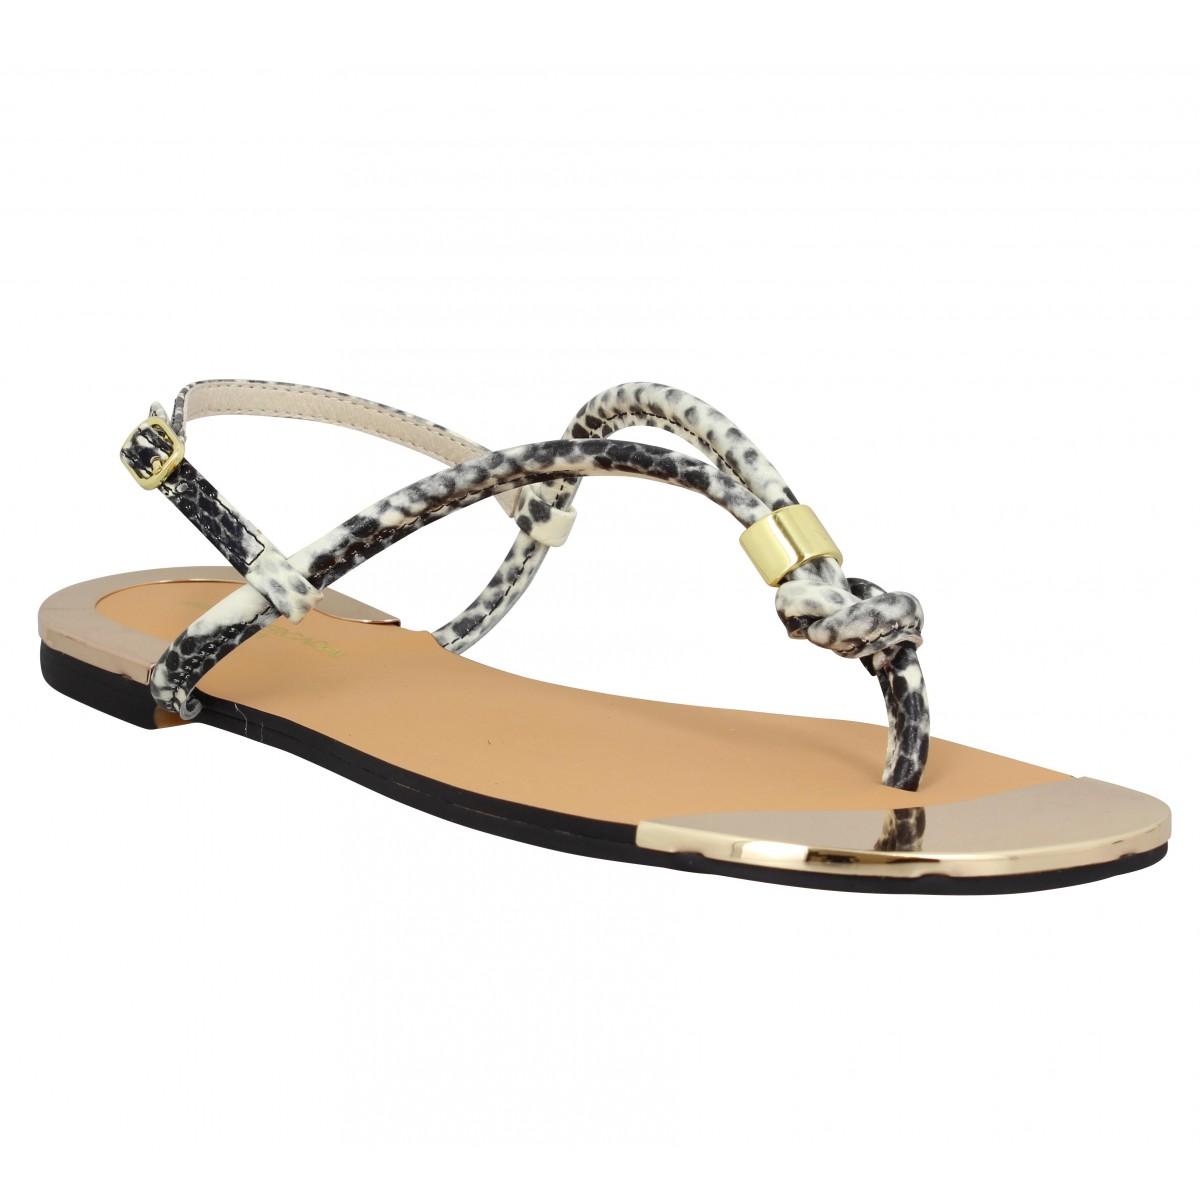 Nu-pieds ATELIER MERCADAL Plage python Femme Naturel